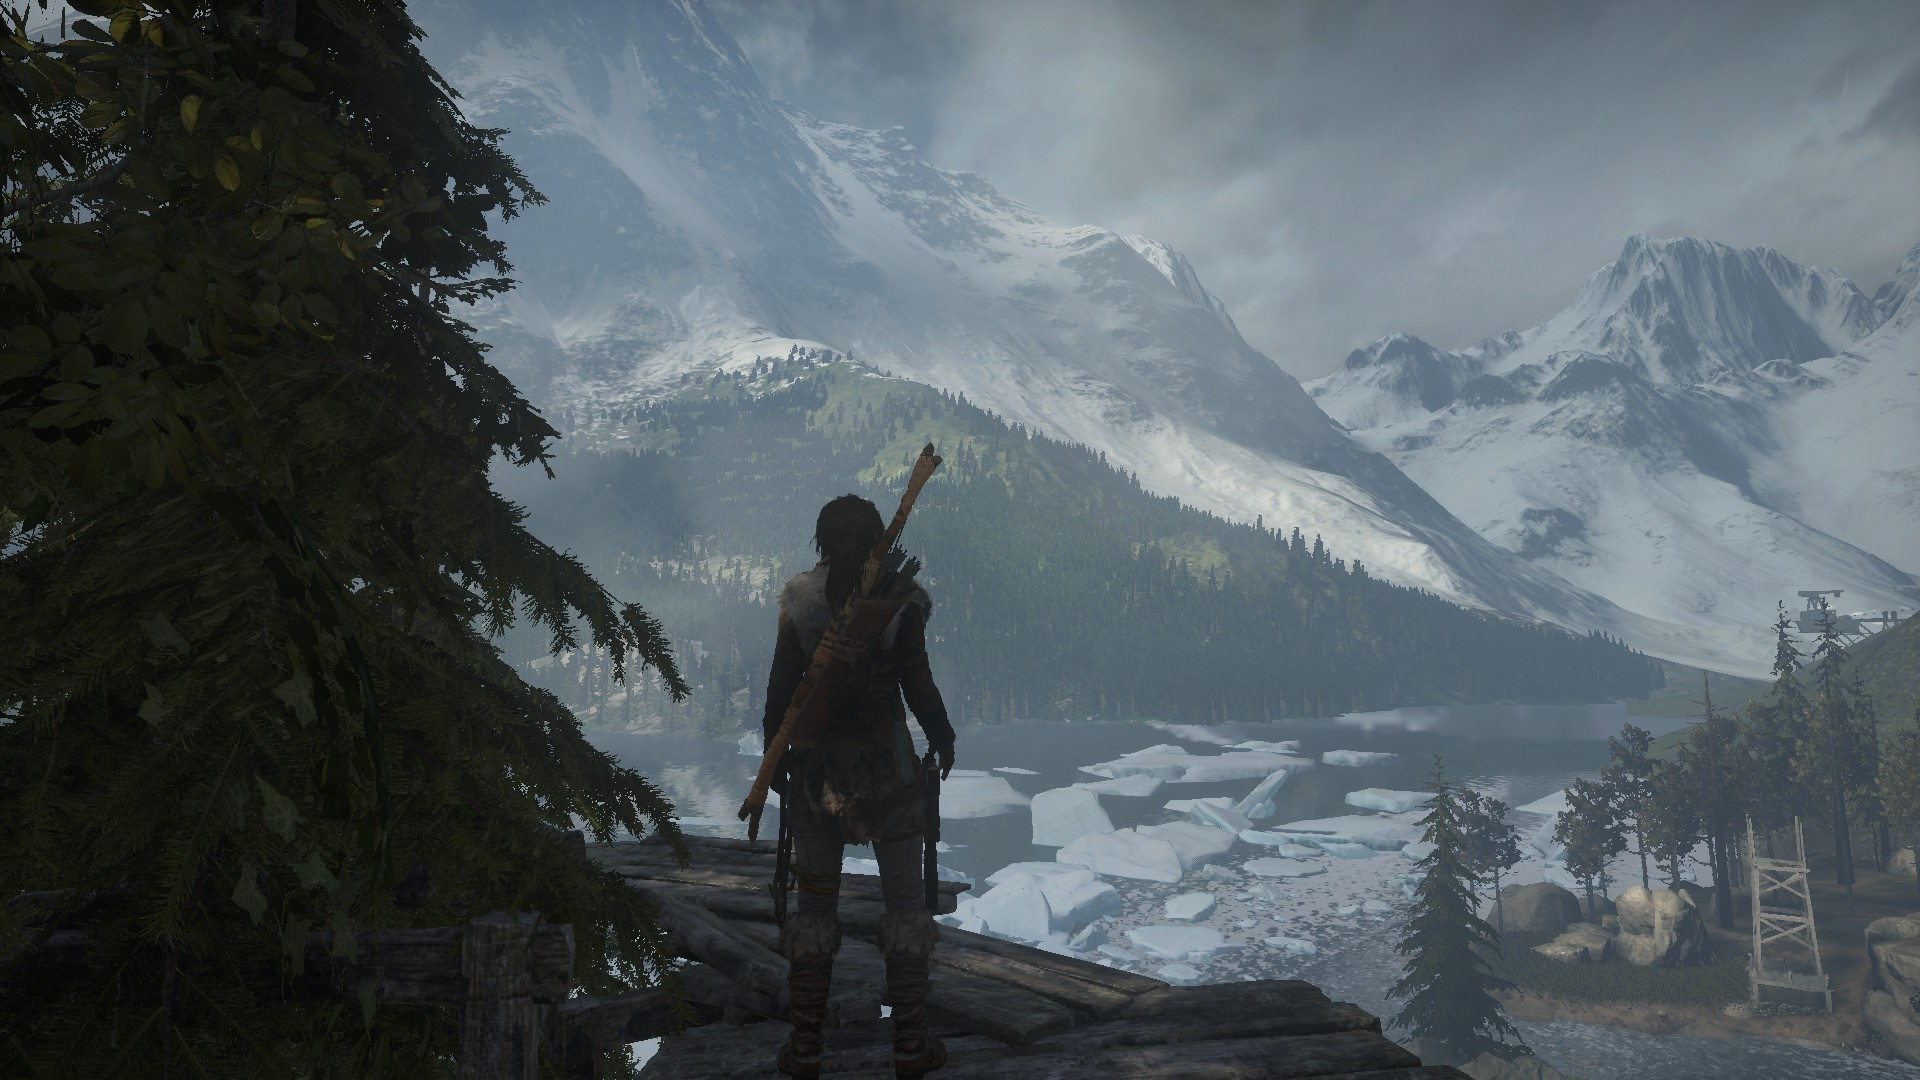 20171223120907_1.jpg - Rise of the Tomb Raider